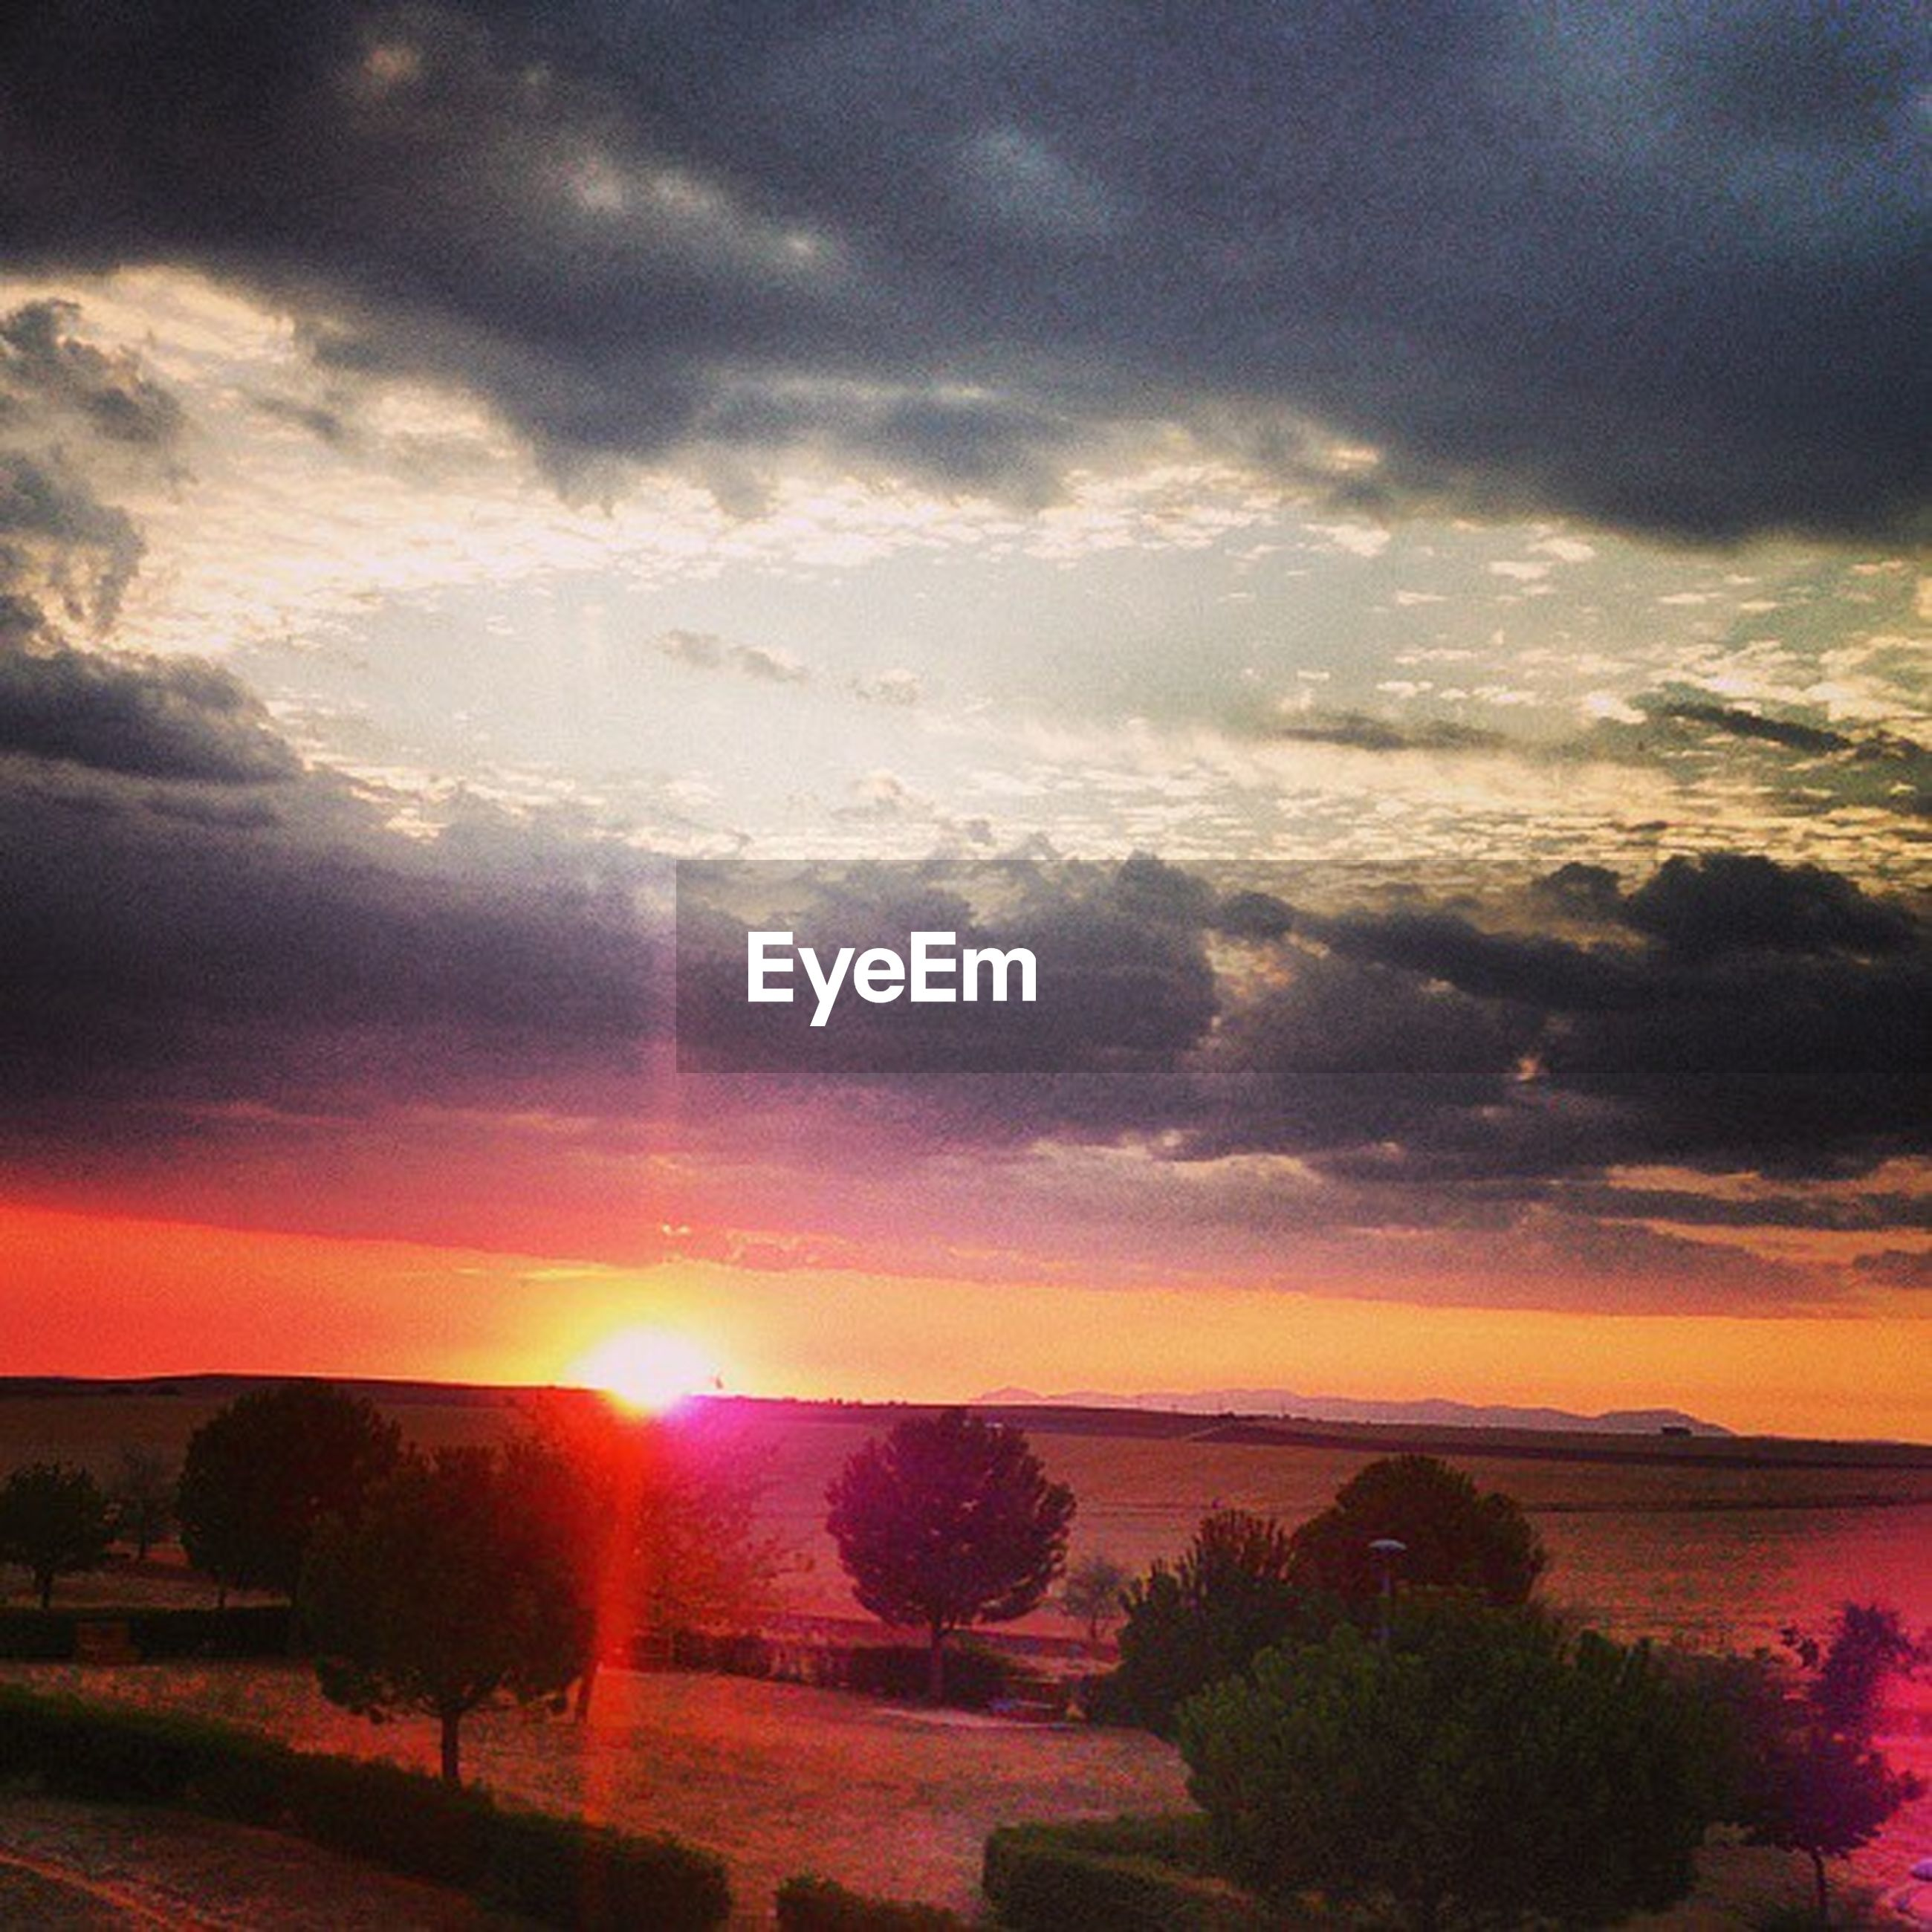 sunset, sky, sun, cloud - sky, scenics, tranquil scene, beauty in nature, water, tranquility, sunbeam, sea, cloudy, sunlight, nature, horizon over water, idyllic, cloud, orange color, silhouette, dramatic sky